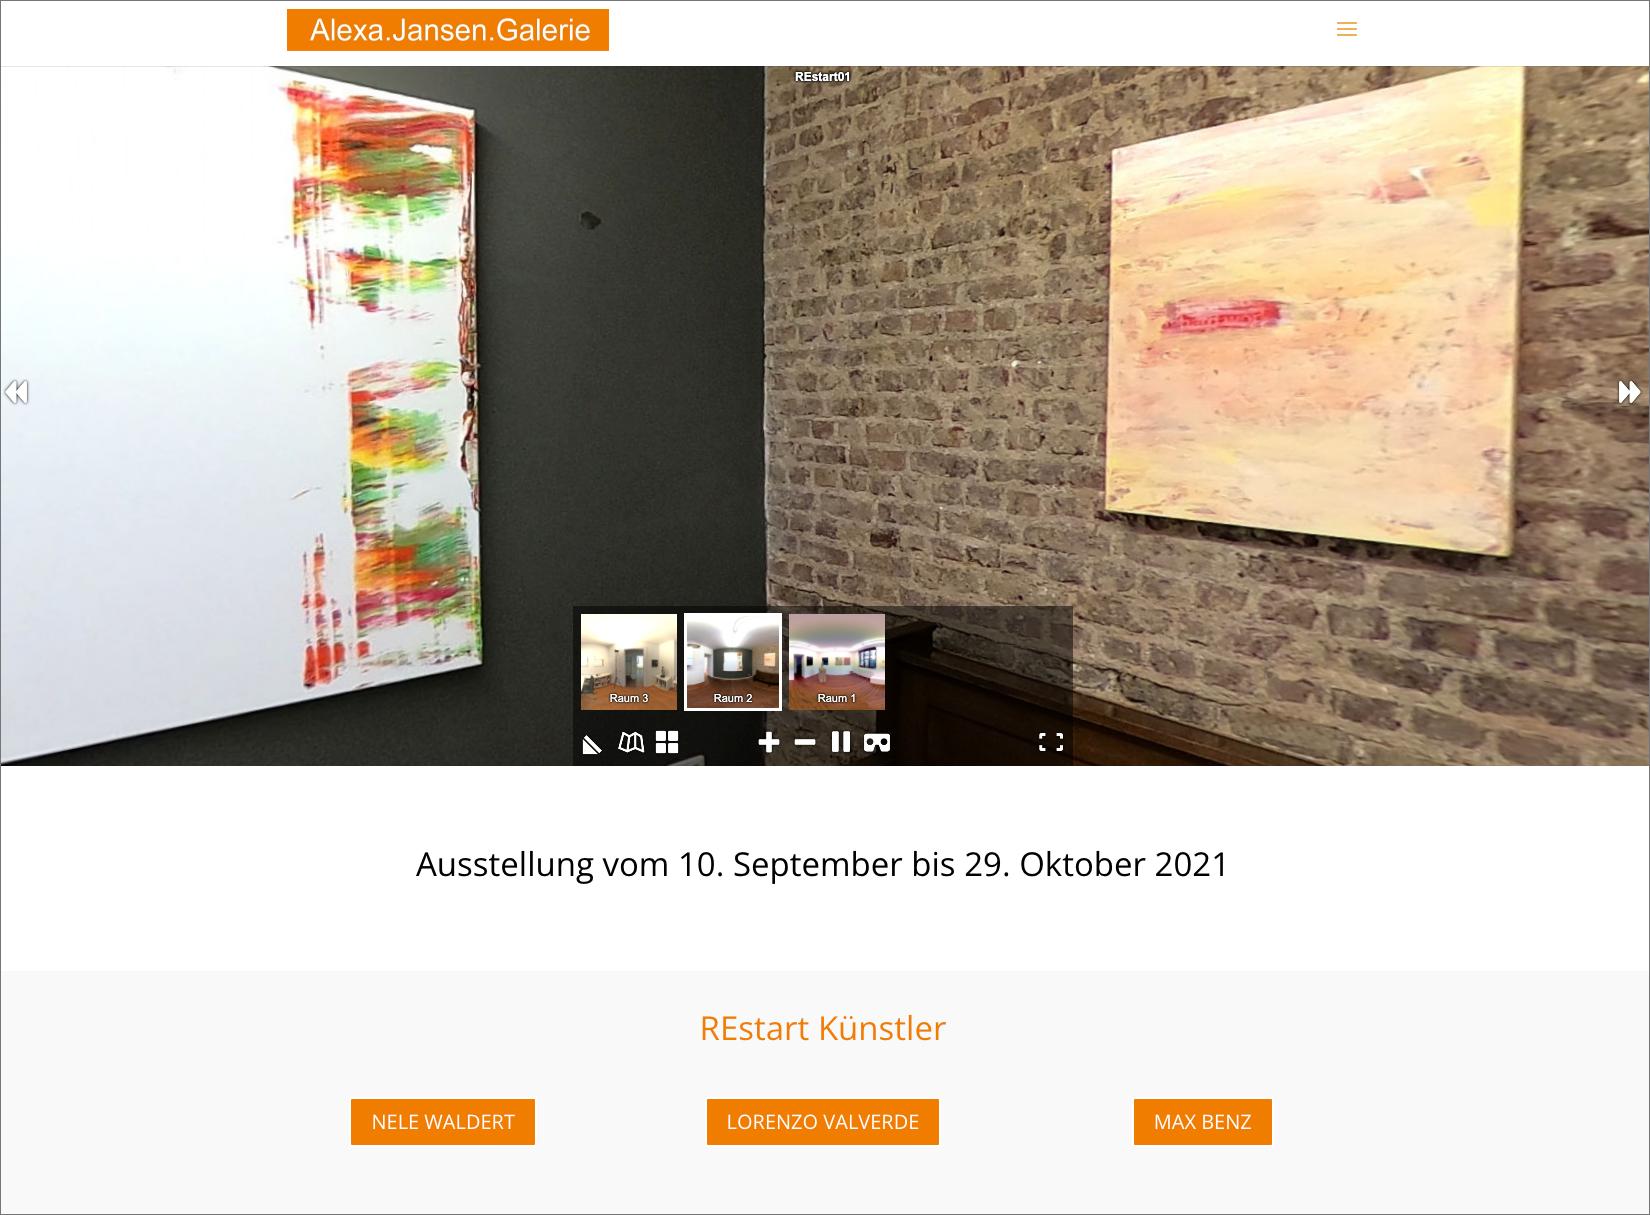 Galerie Alexa Jansen